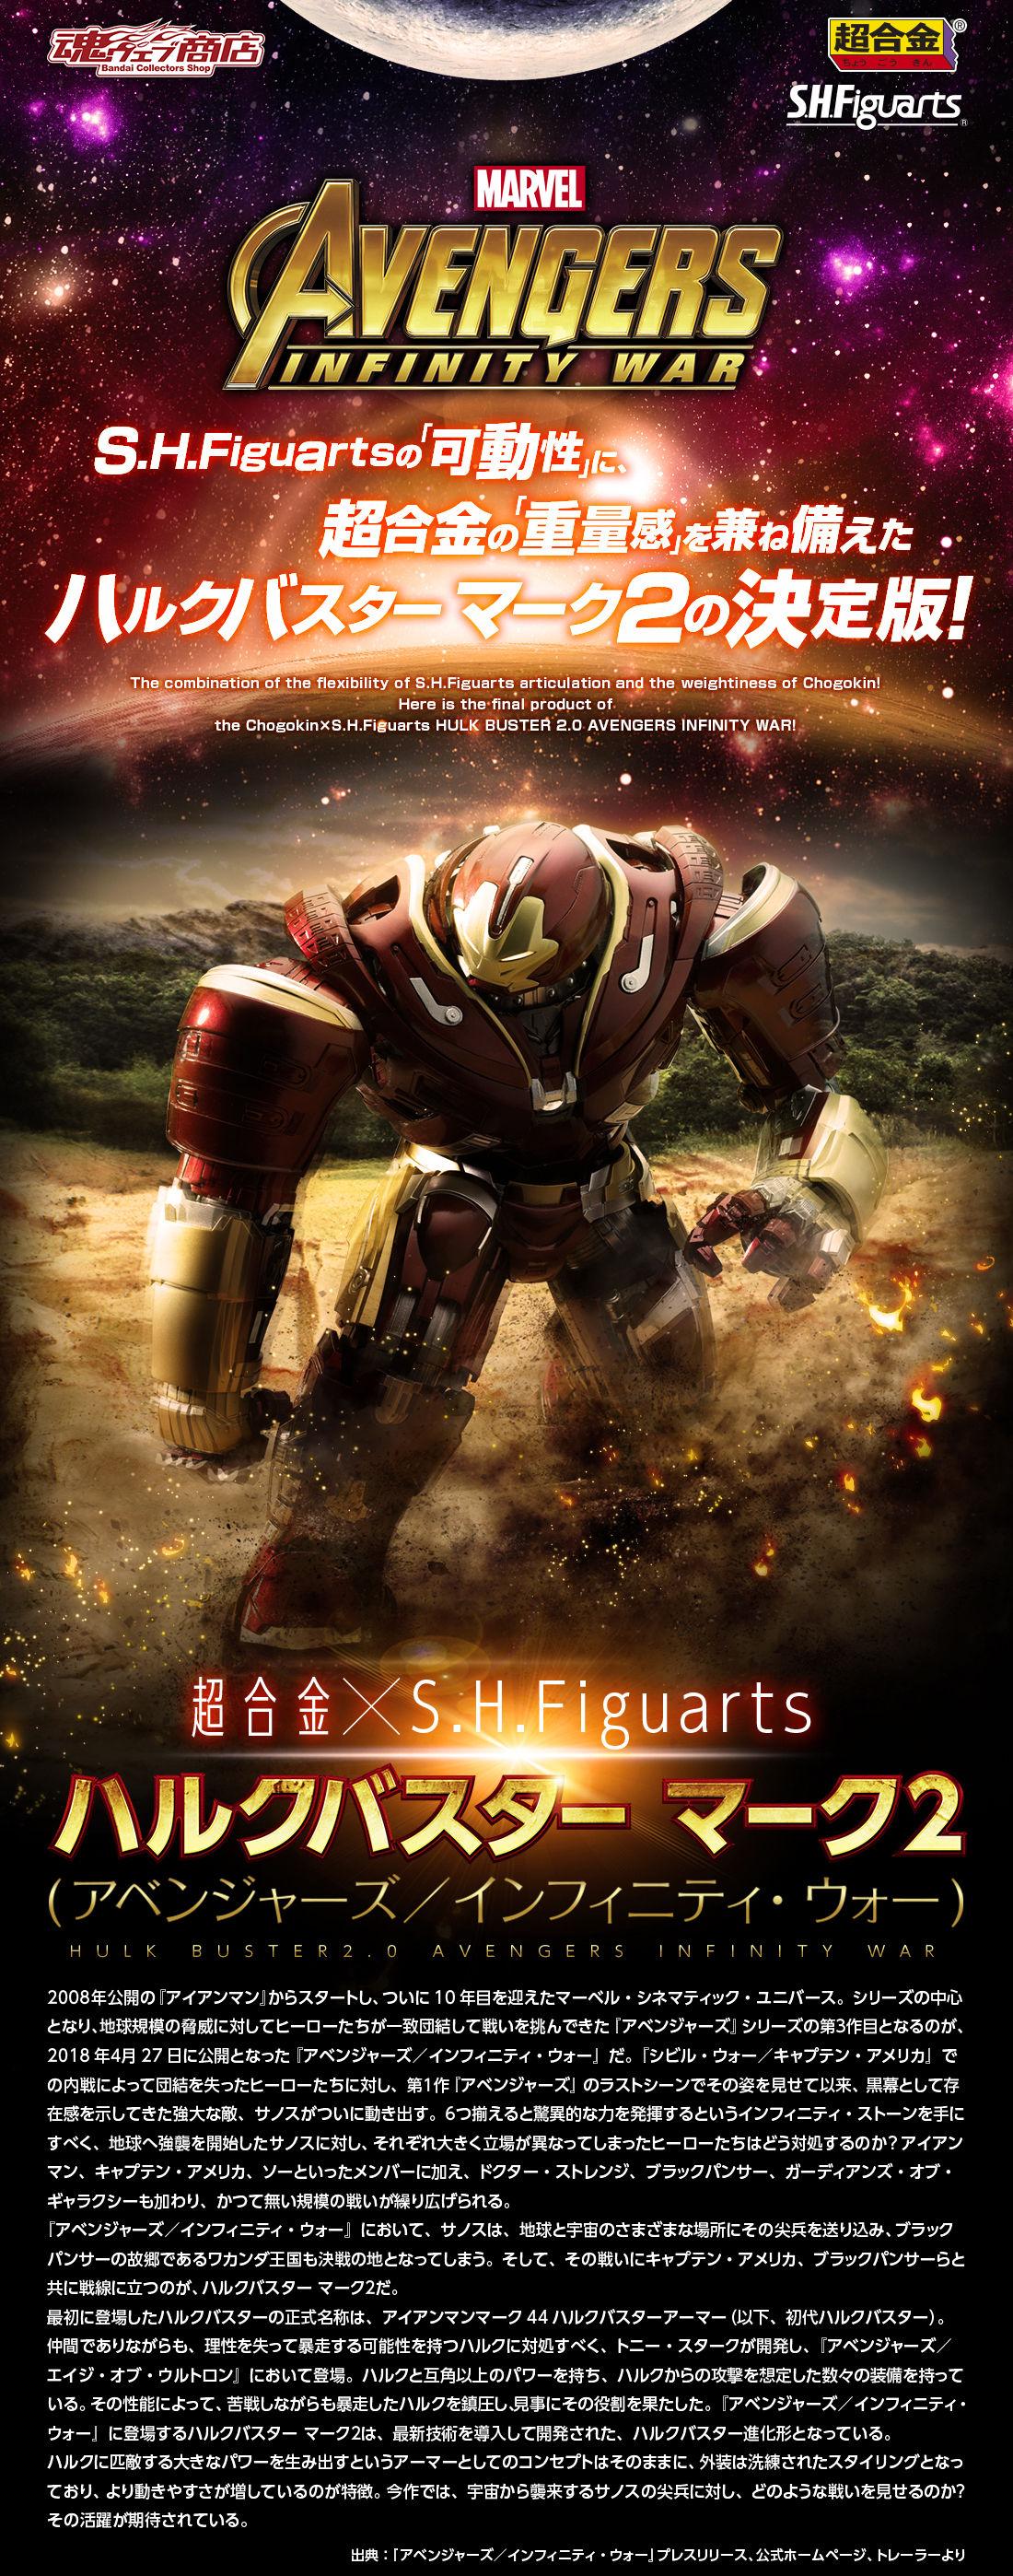 超合金 X S.H.FIGUARTS HULKBUSTER MARK 2 (復仇者/無限戰爭)